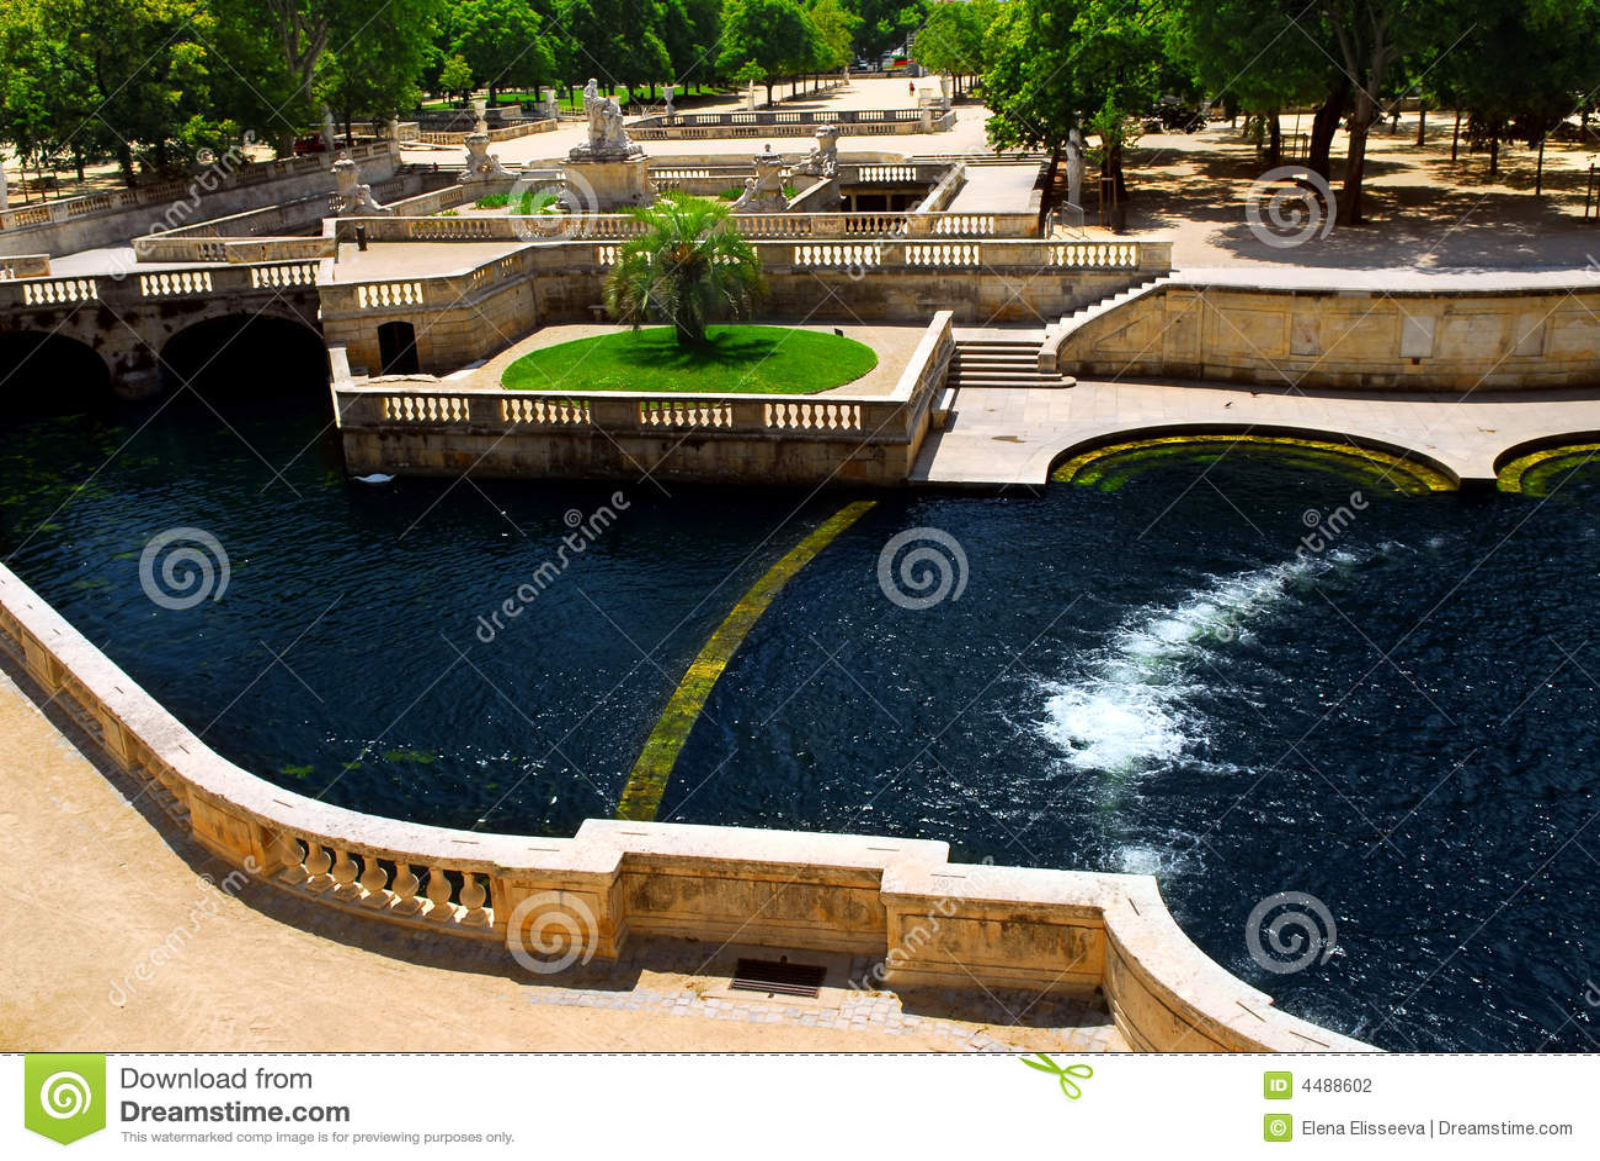 jardin de la fontaine in nimes france stock photography image 4488602. Black Bedroom Furniture Sets. Home Design Ideas